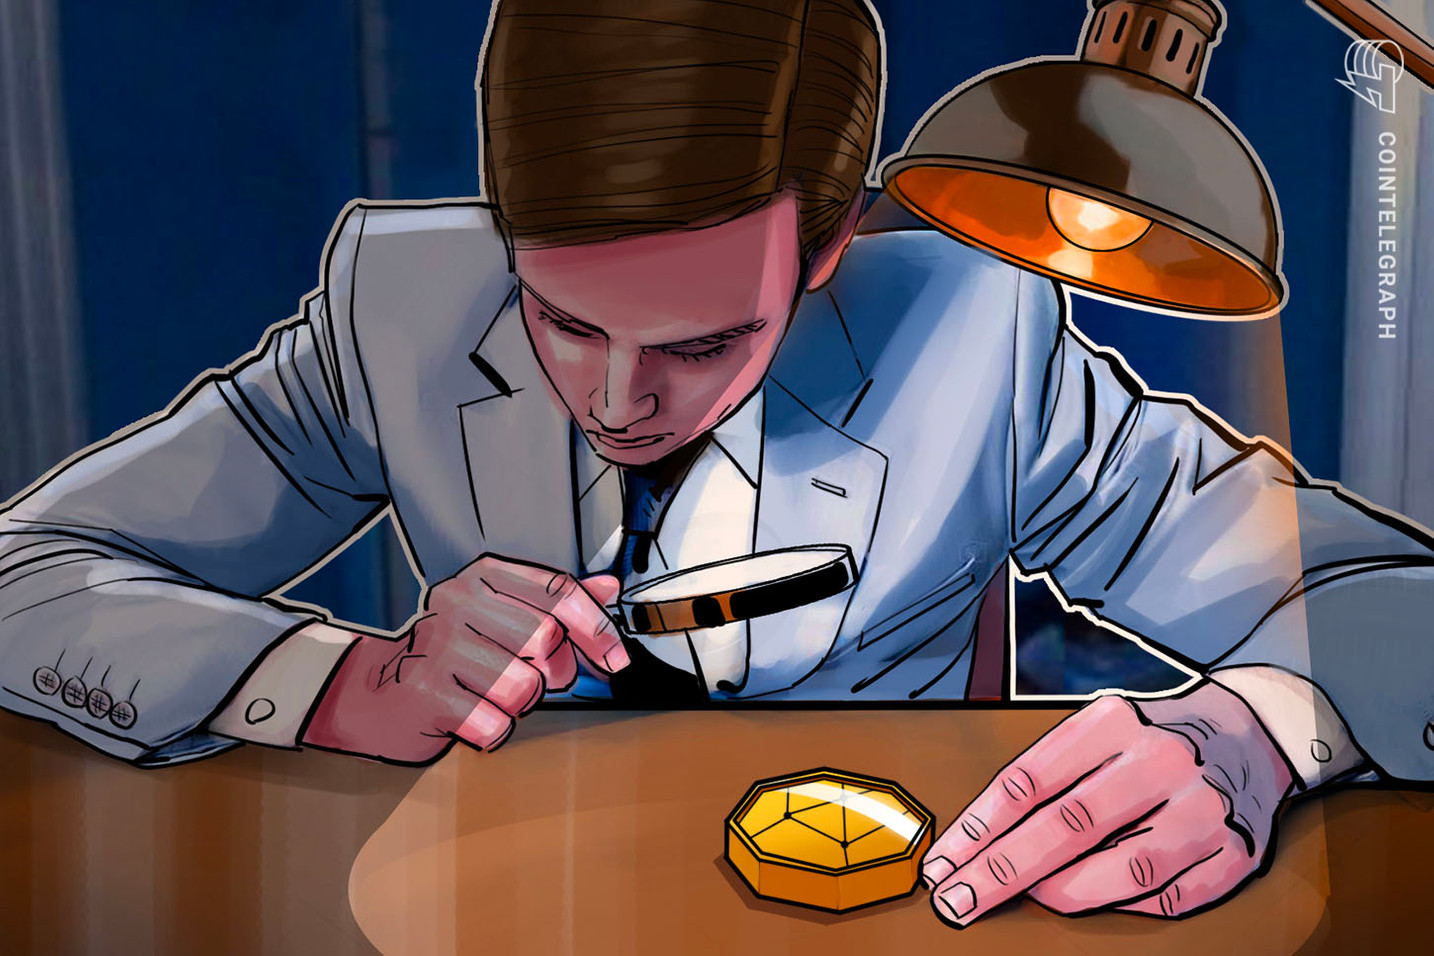 Canadian Banks Wary of QuadrigaCX Assets' Origins, Cite Money Laundering Concerns